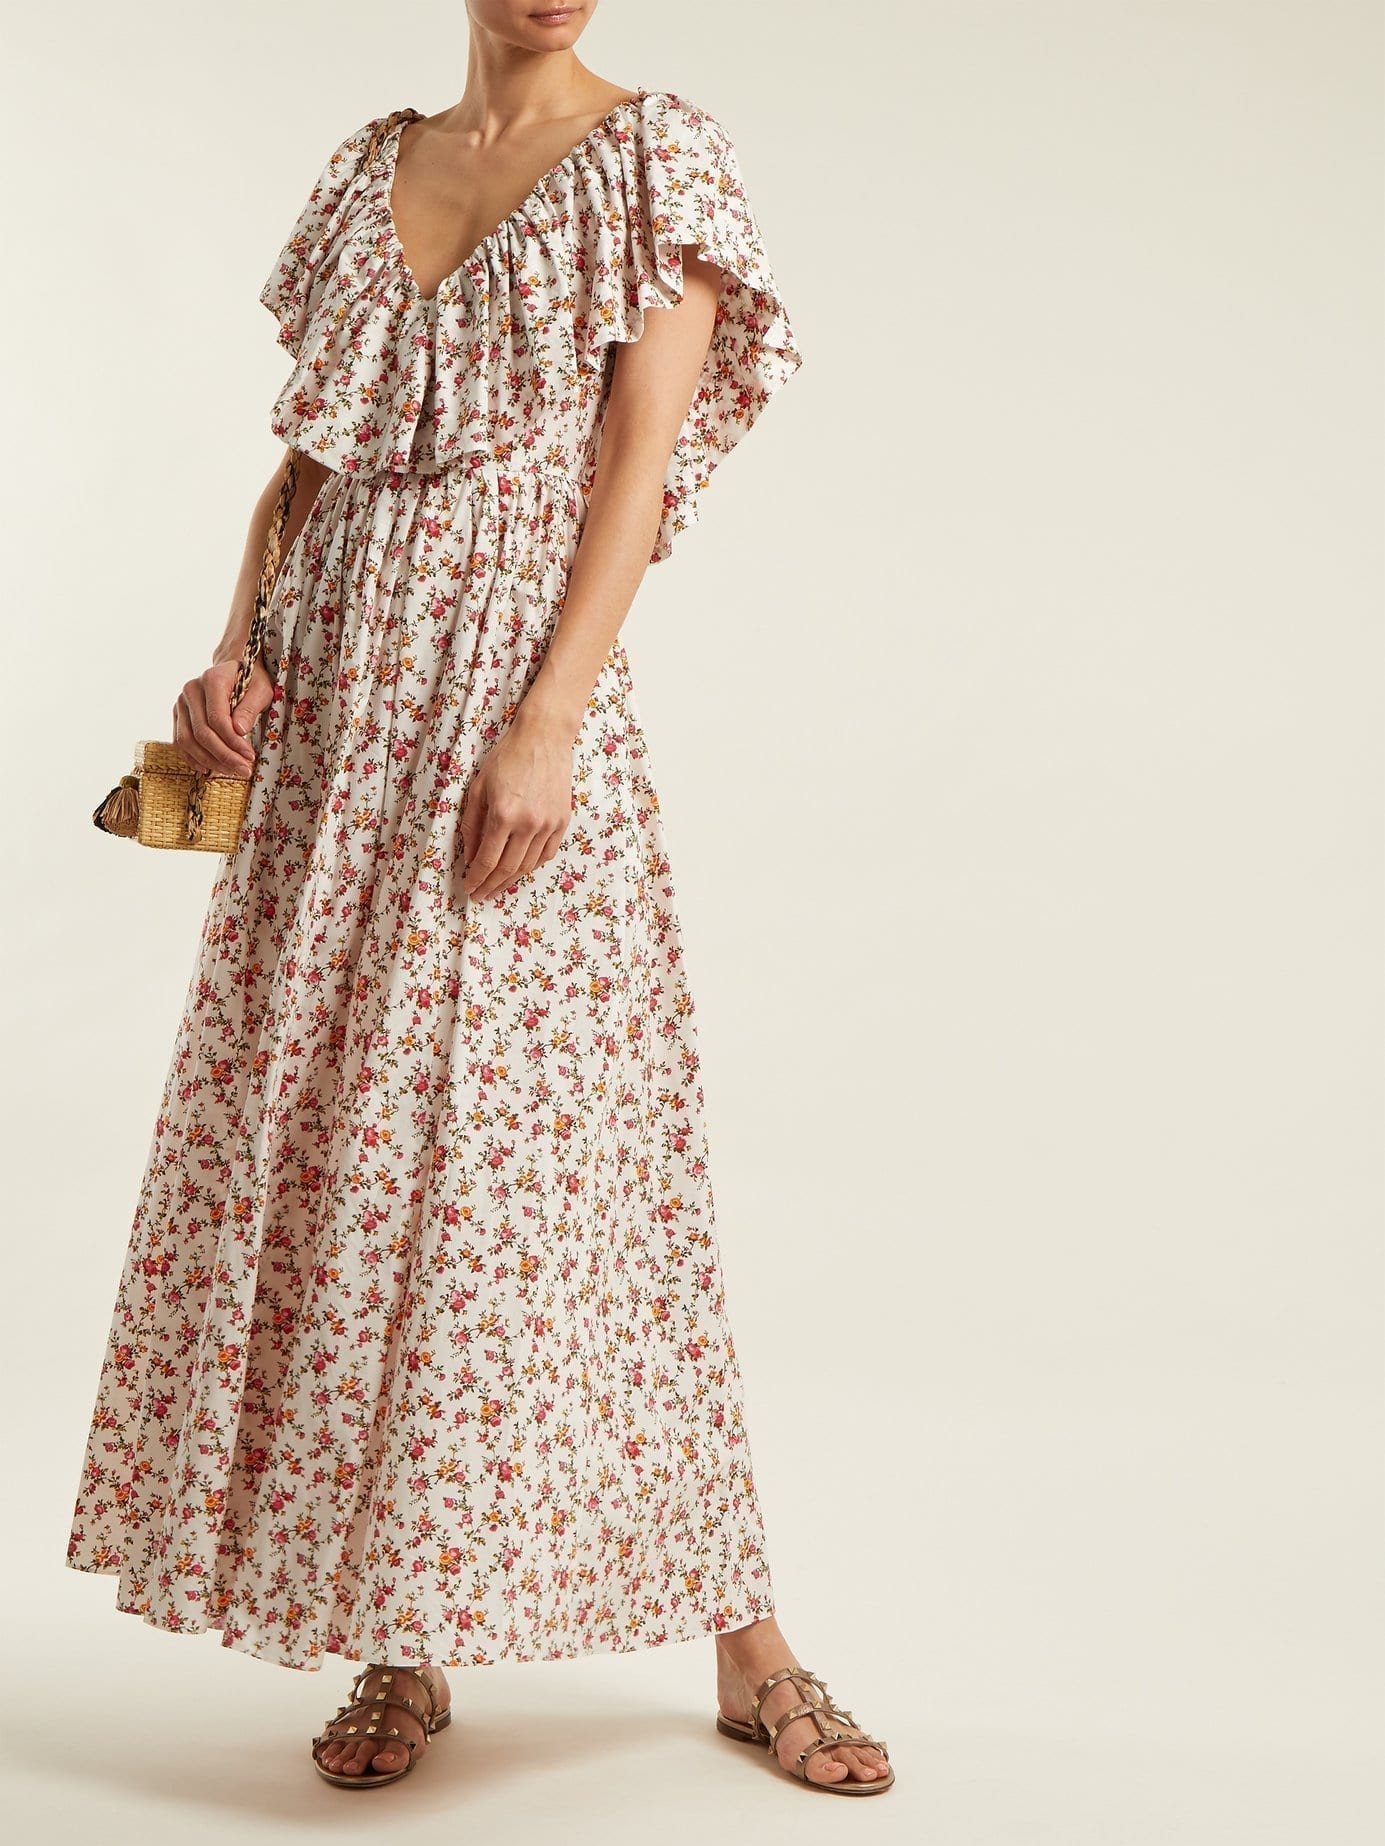 EMILIA WICKSTEAD Jarvis Cotton Maxi Multi / Floral Printed Dress